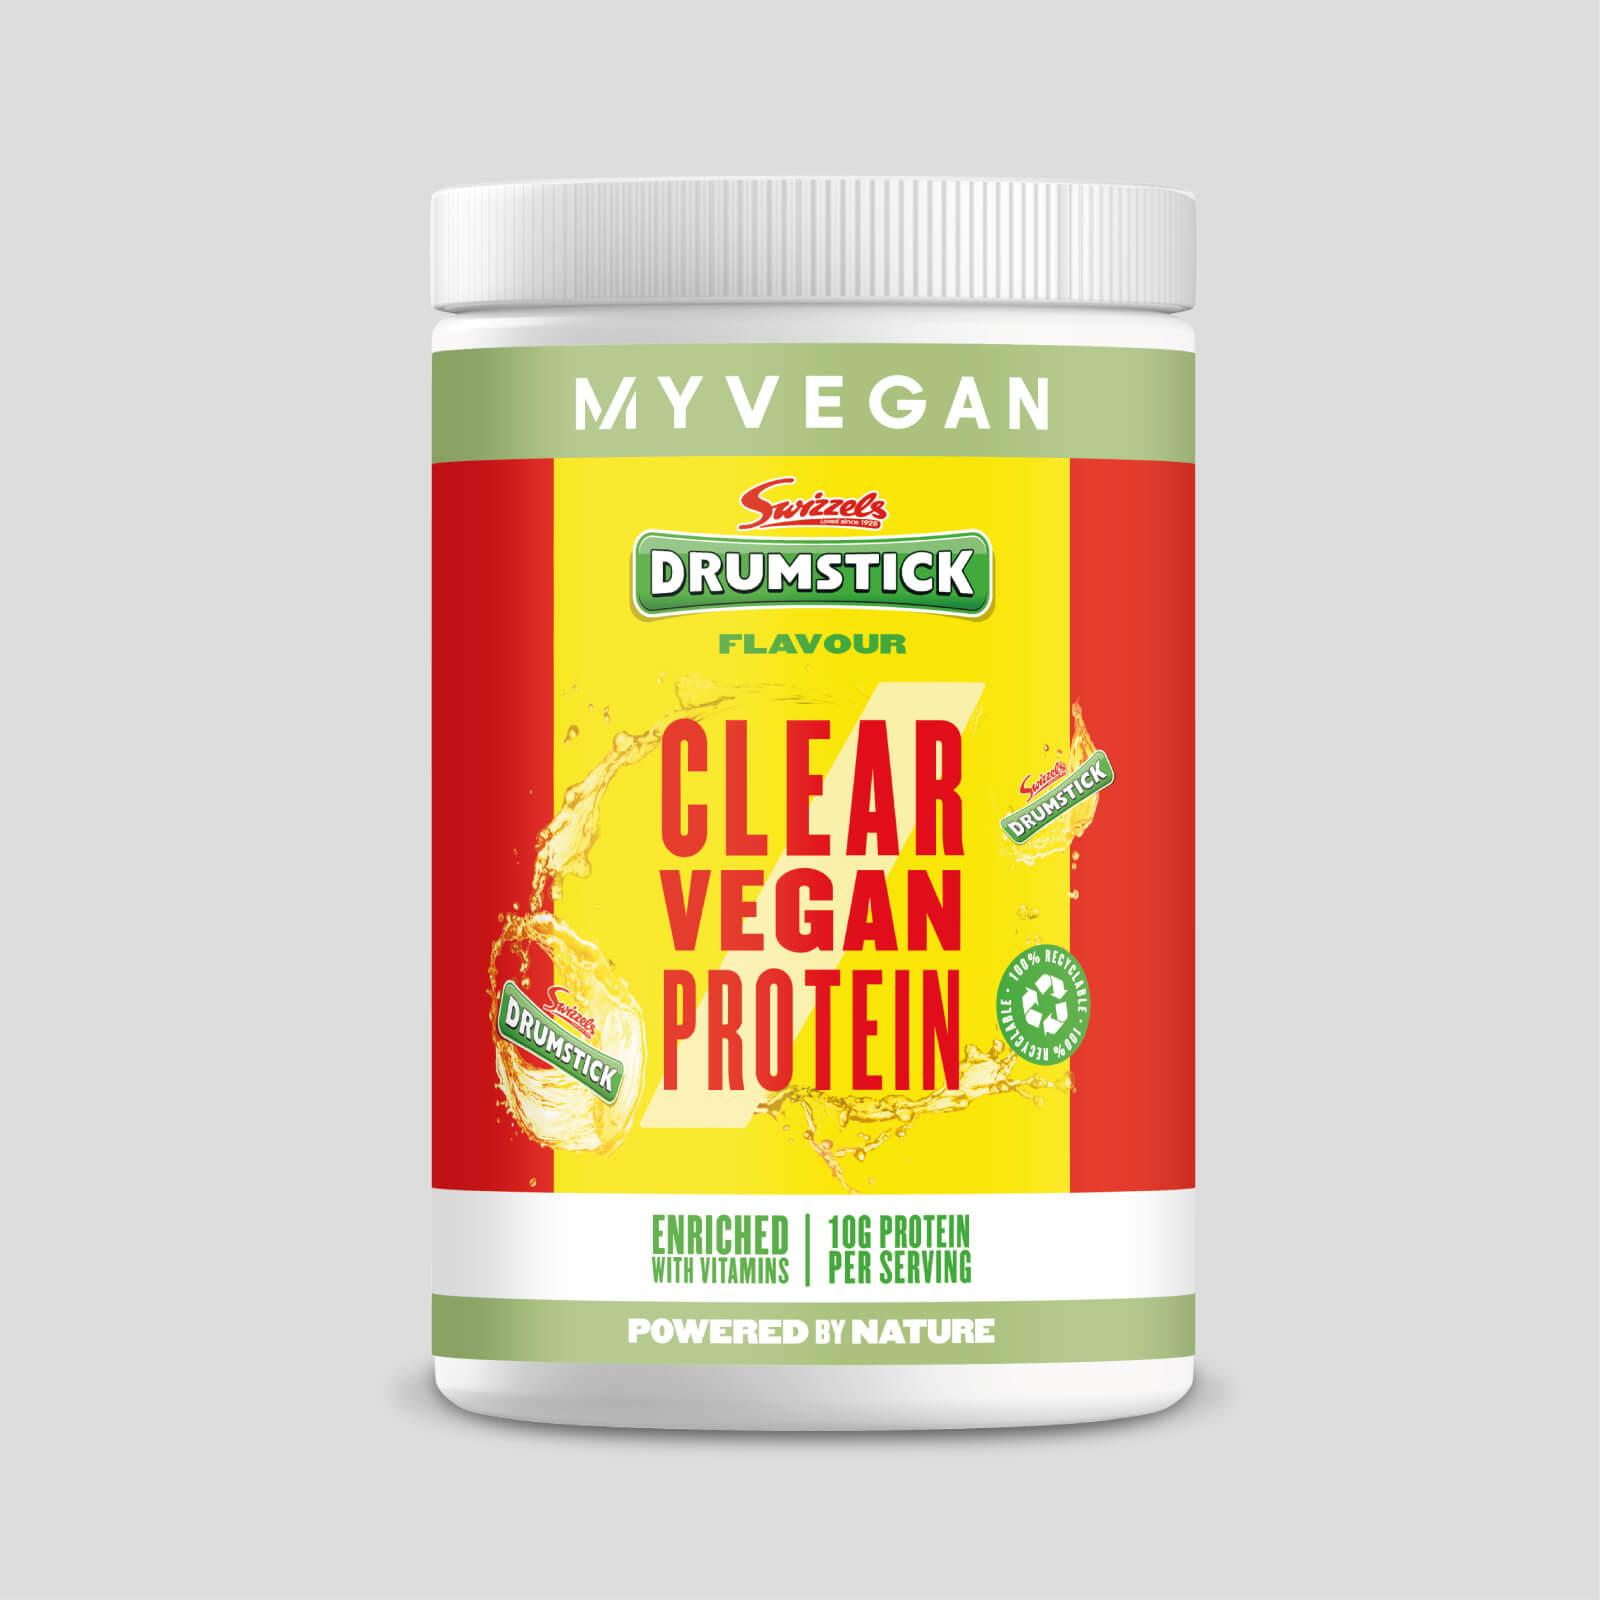 Myprotein Clear Vegan Protein–Swizzels - 10servings - Drumstick